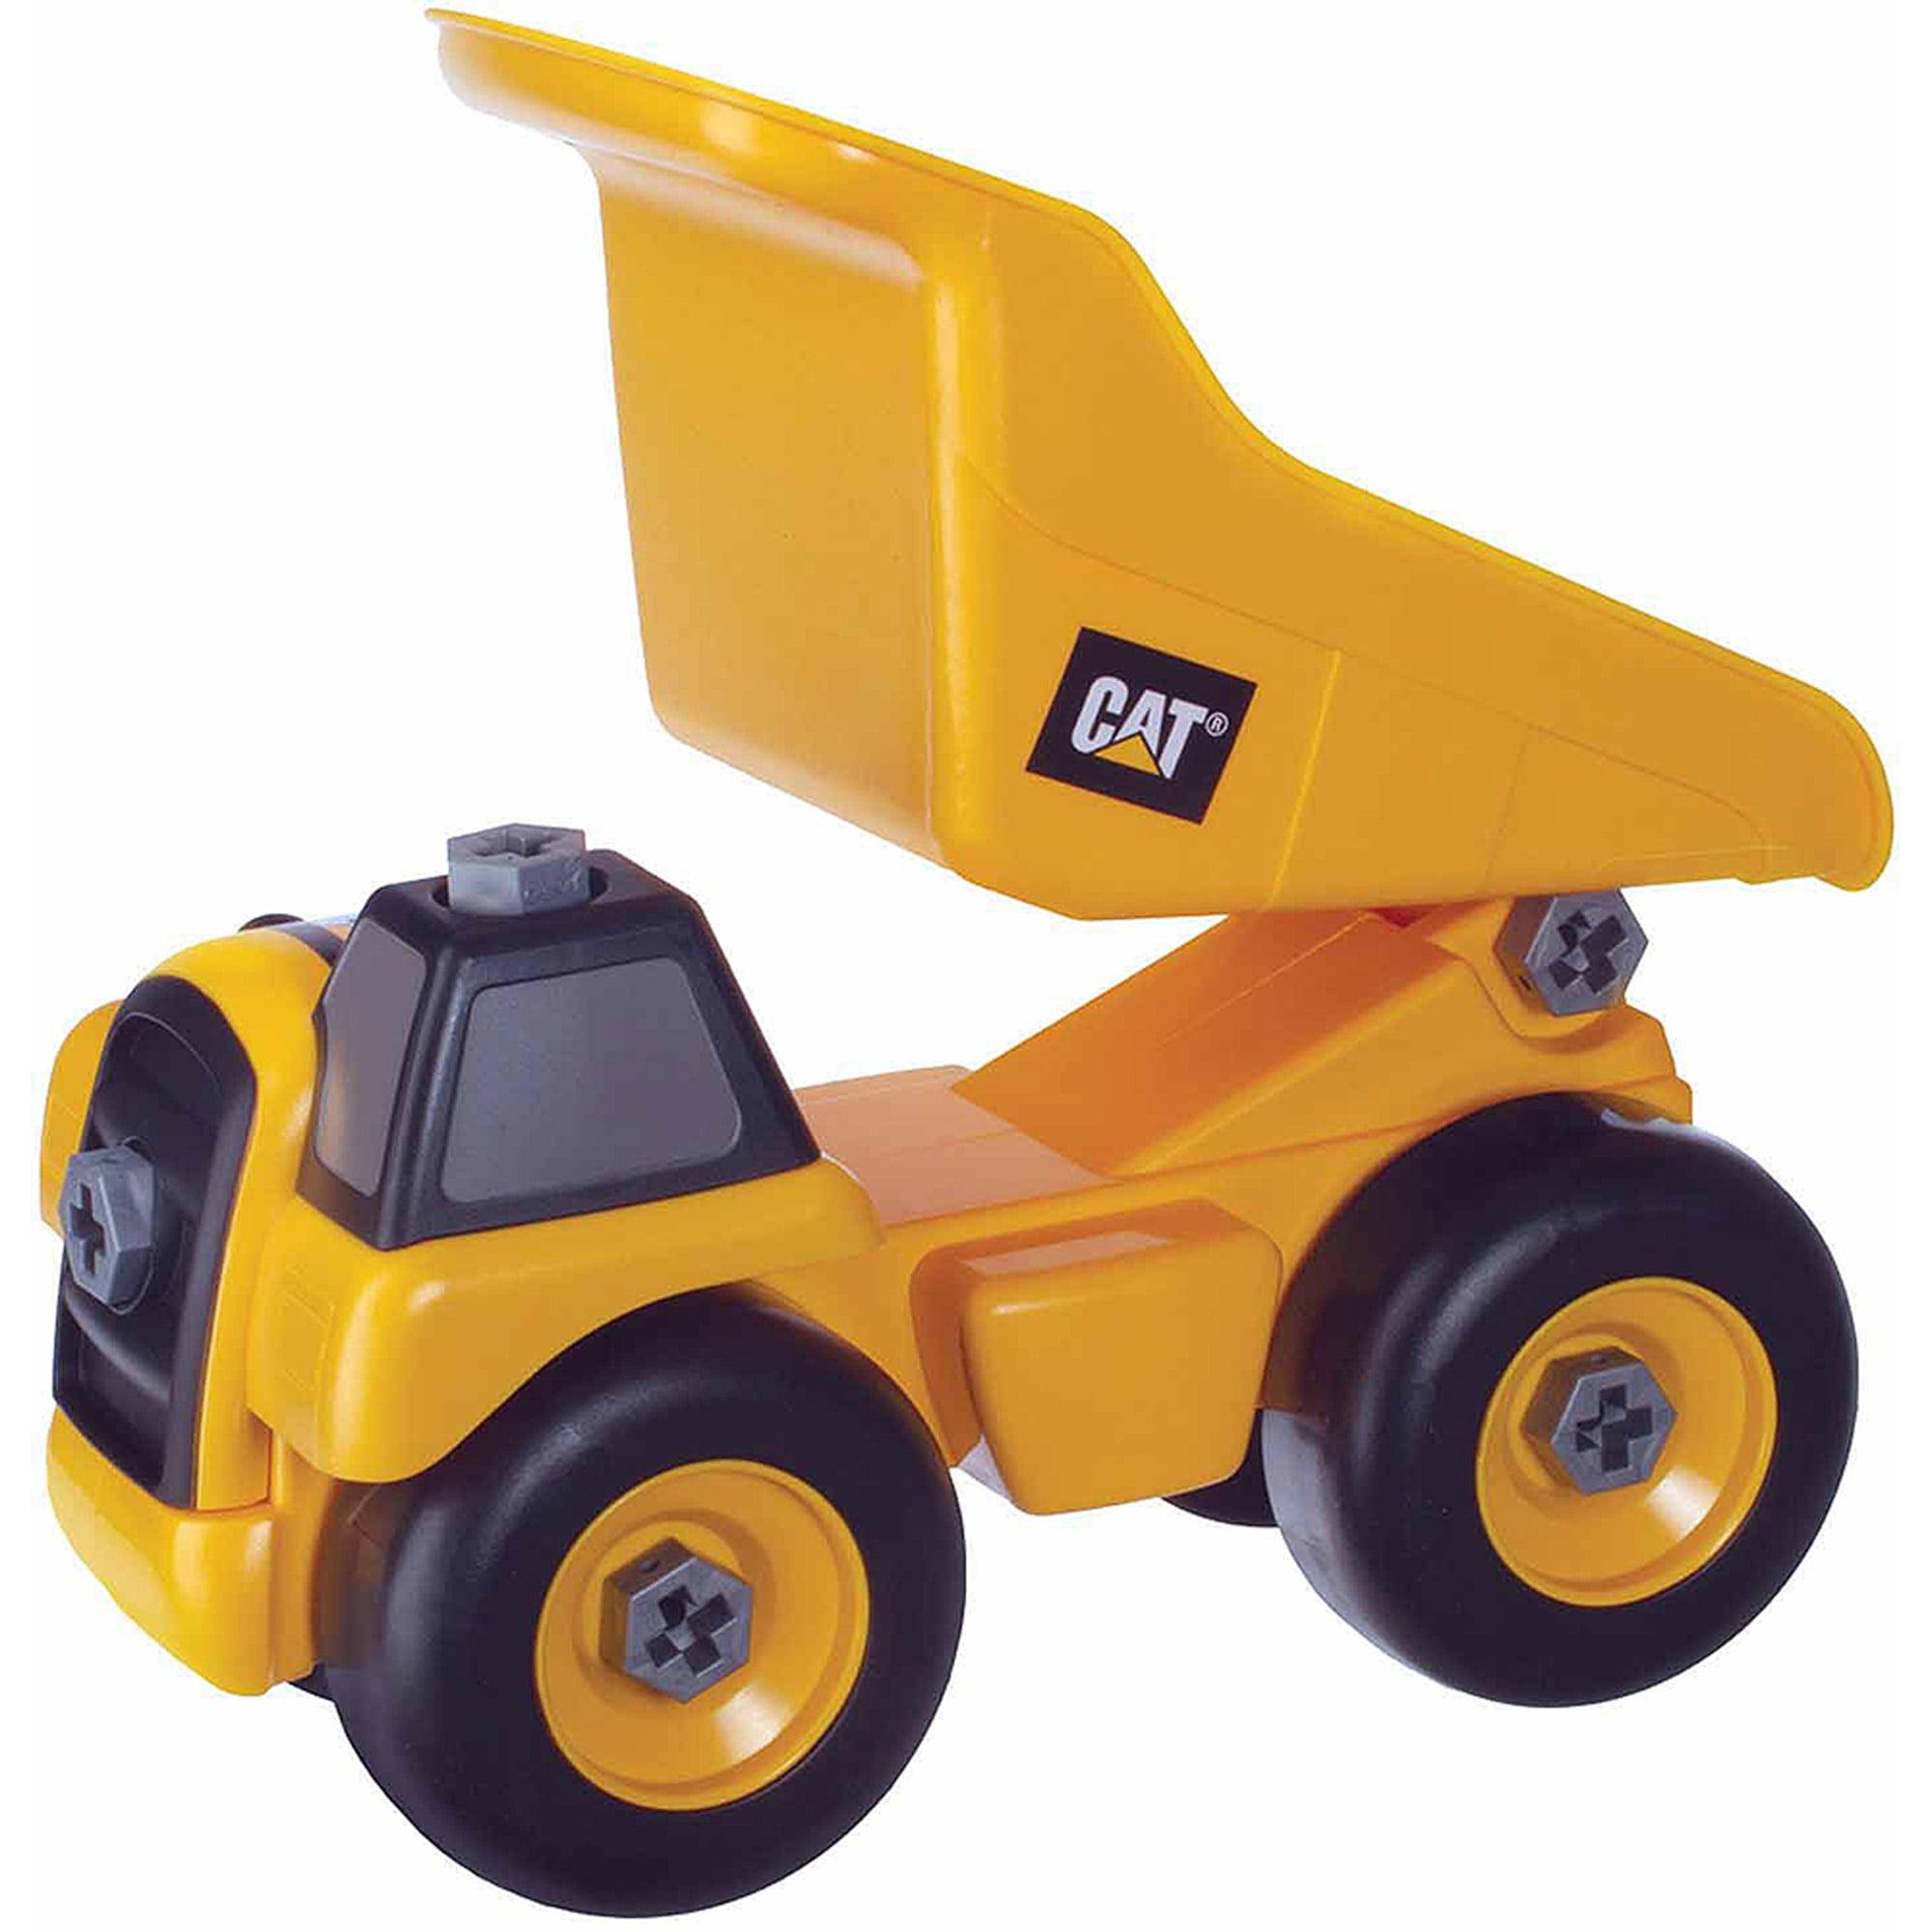 Toysmith Caterpillar Take A Part Dump Truck, Cat